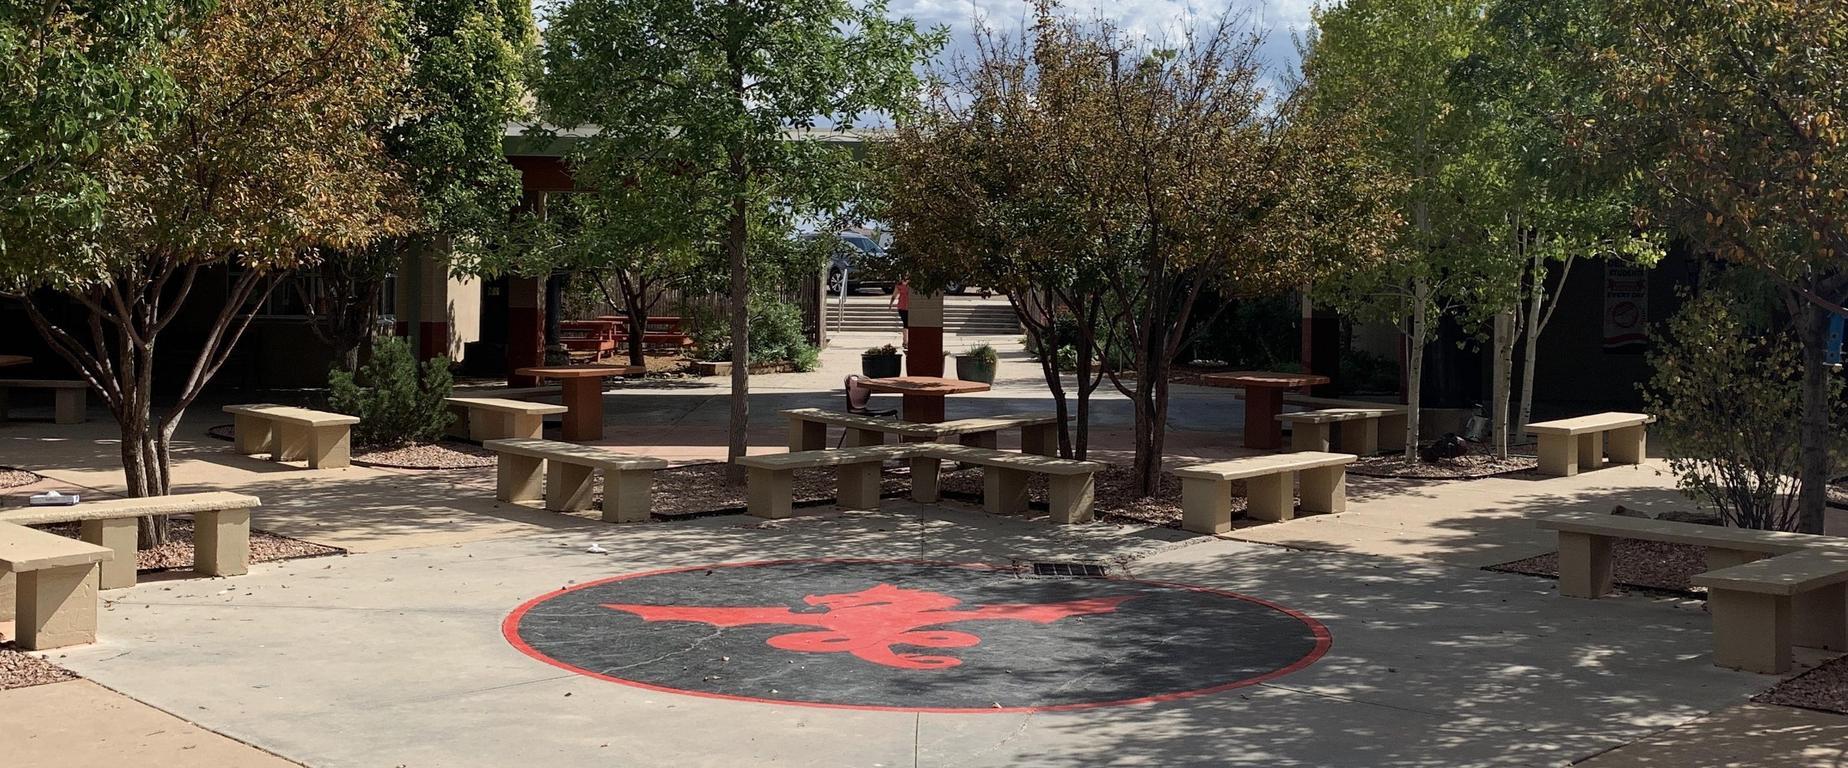 MdS Courtyard